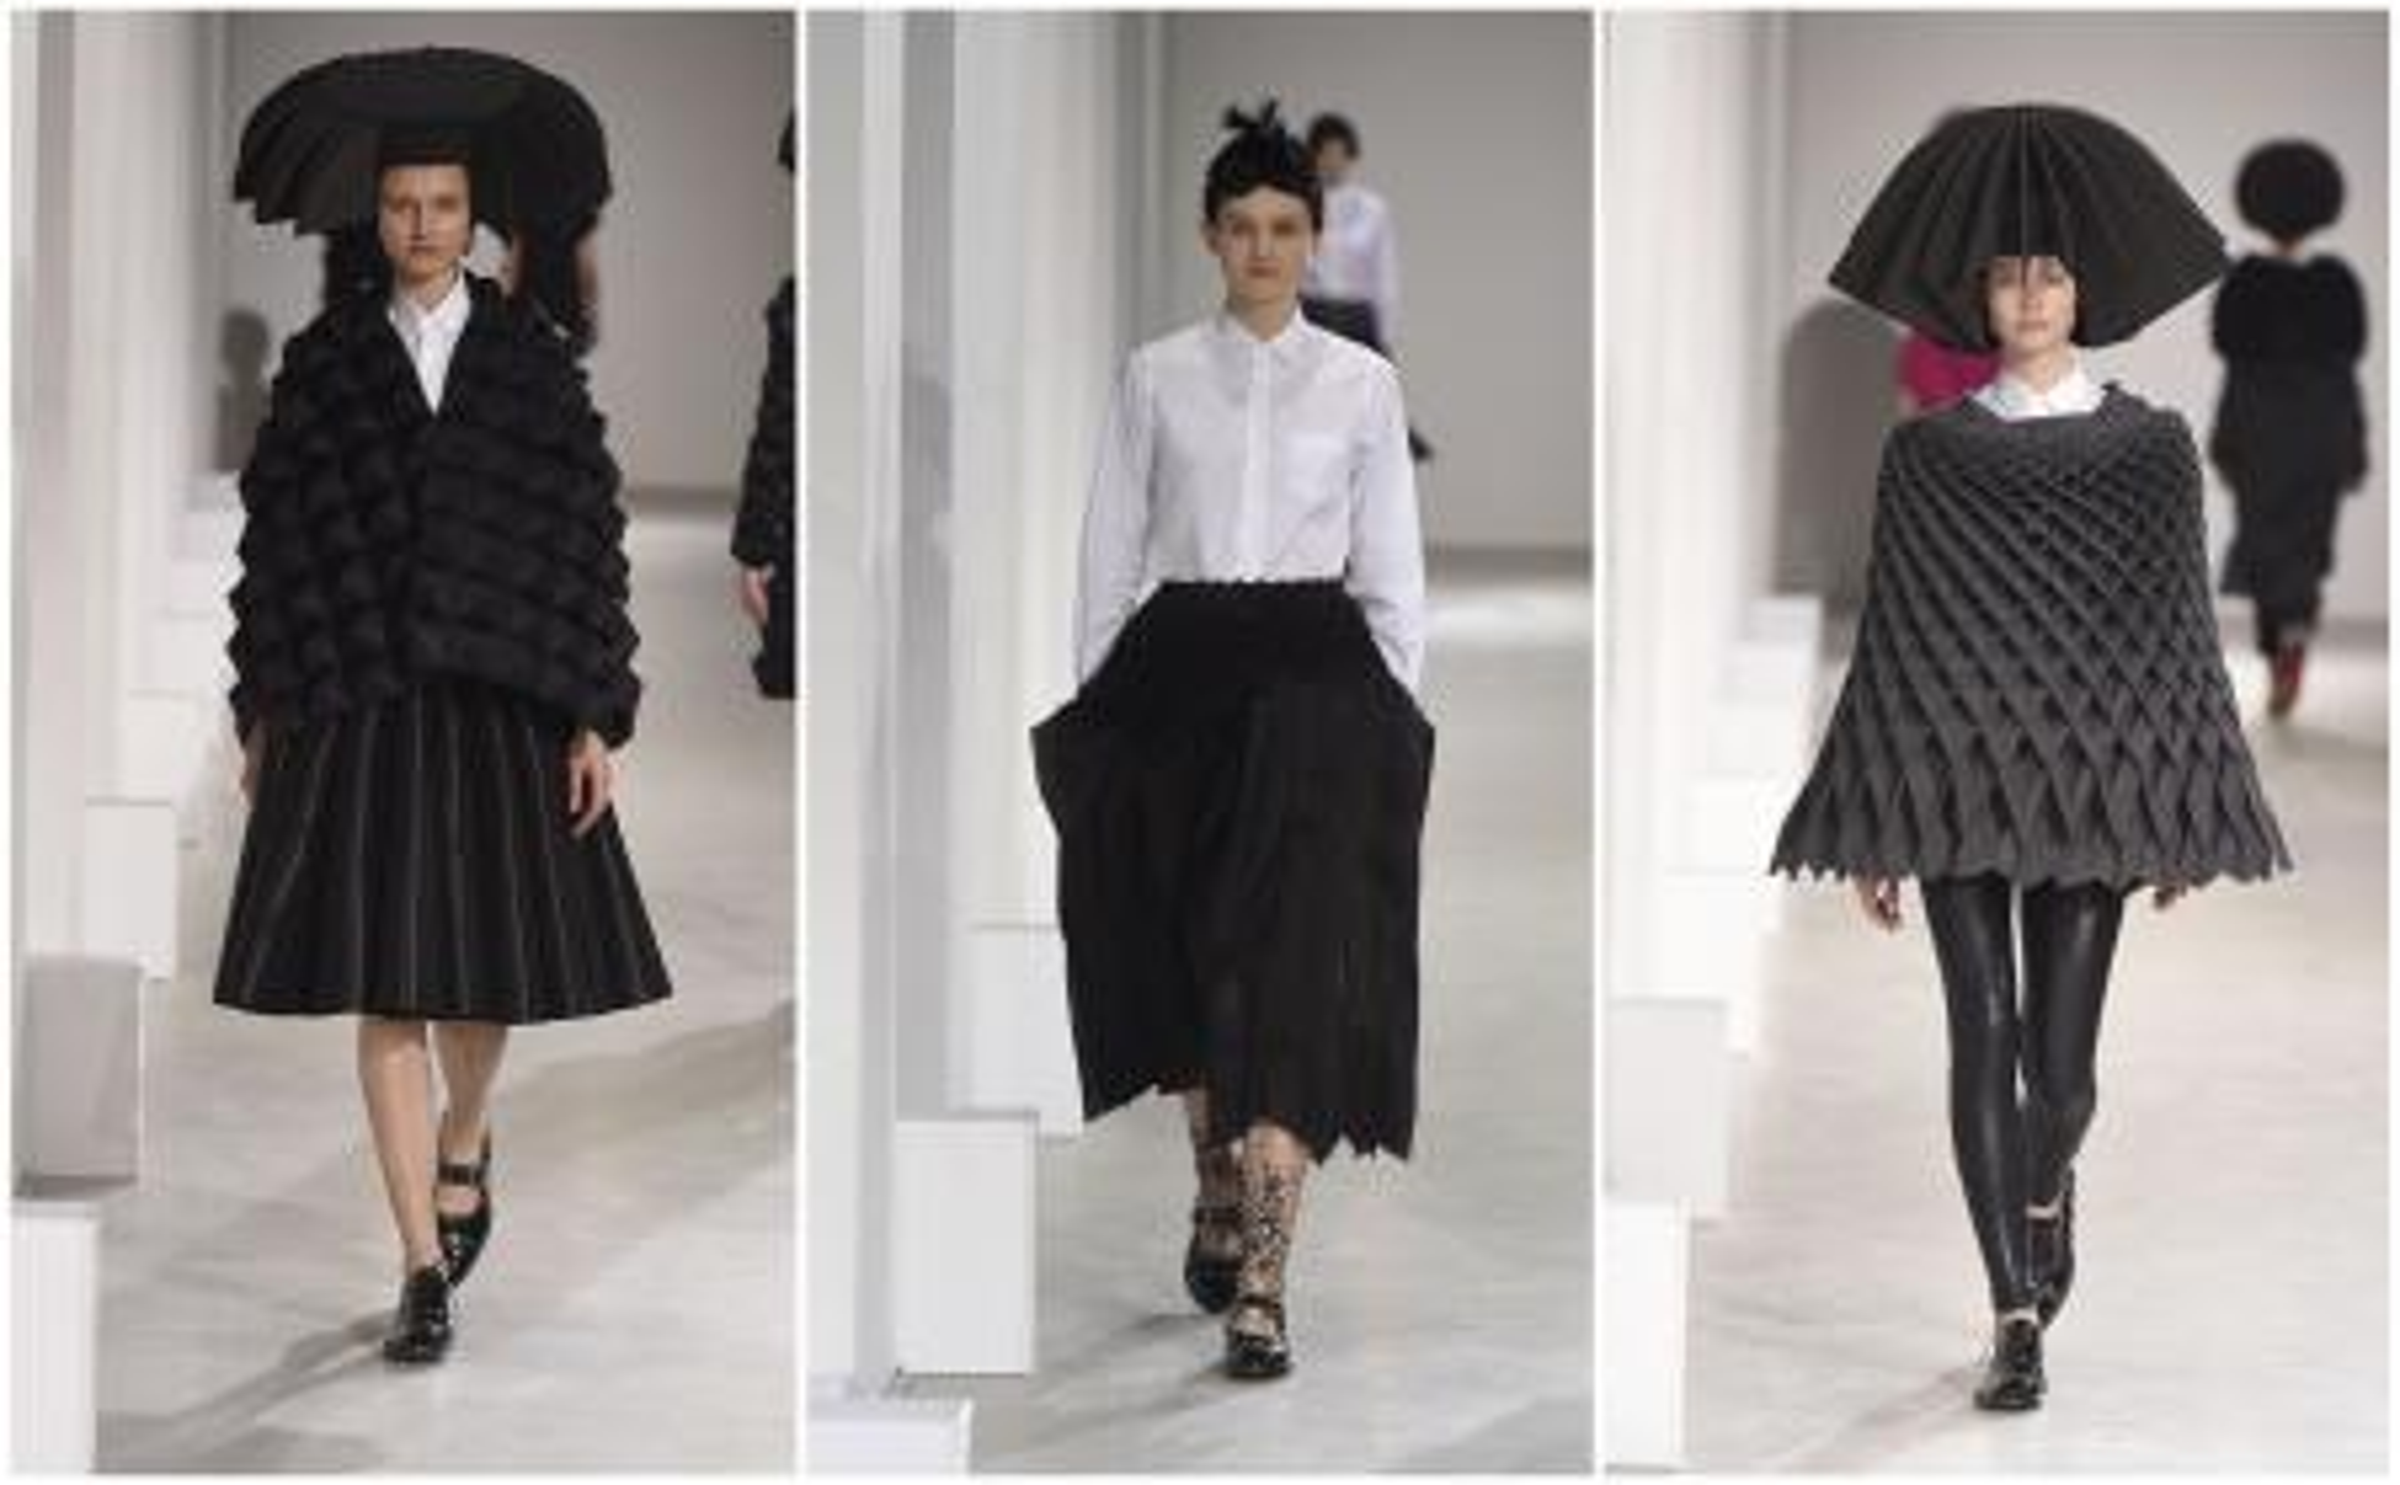 junya watanabe, paris fashion week, fall 2015, fashion, style, art, japan